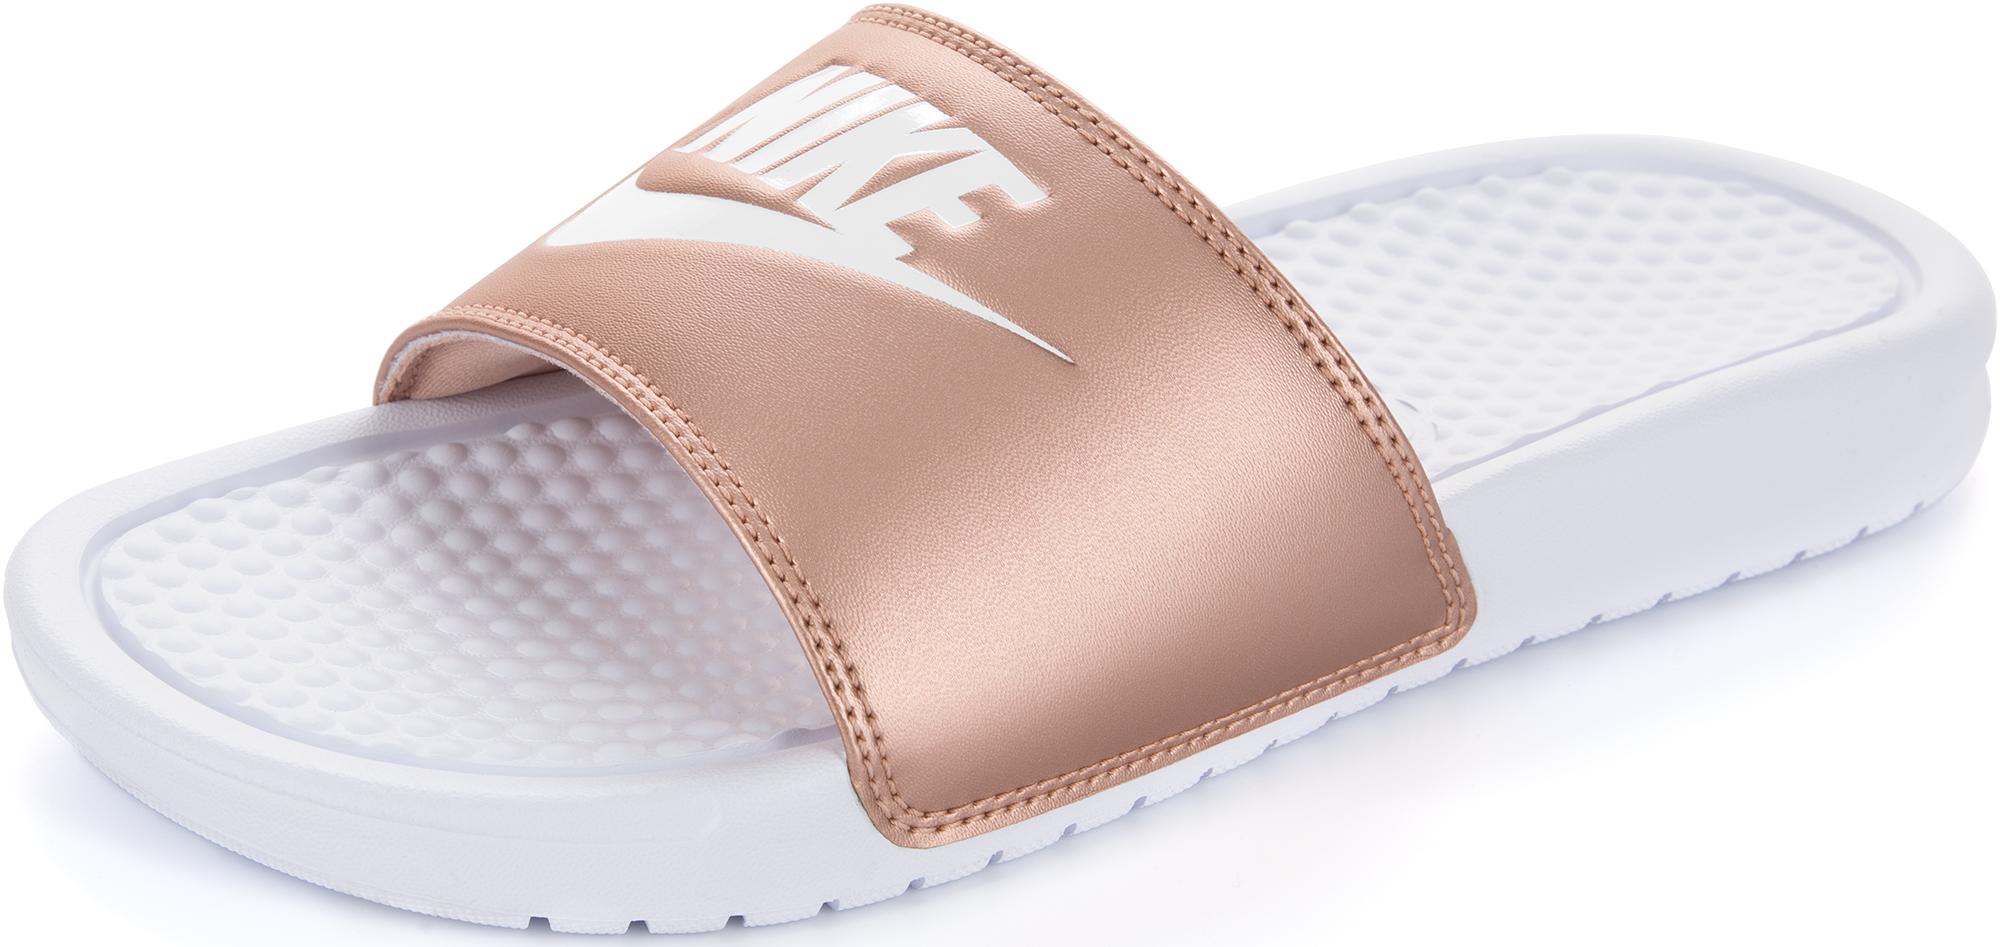 Nike Шлепанцы женские Nike Benassi Jdi, размер 39,5